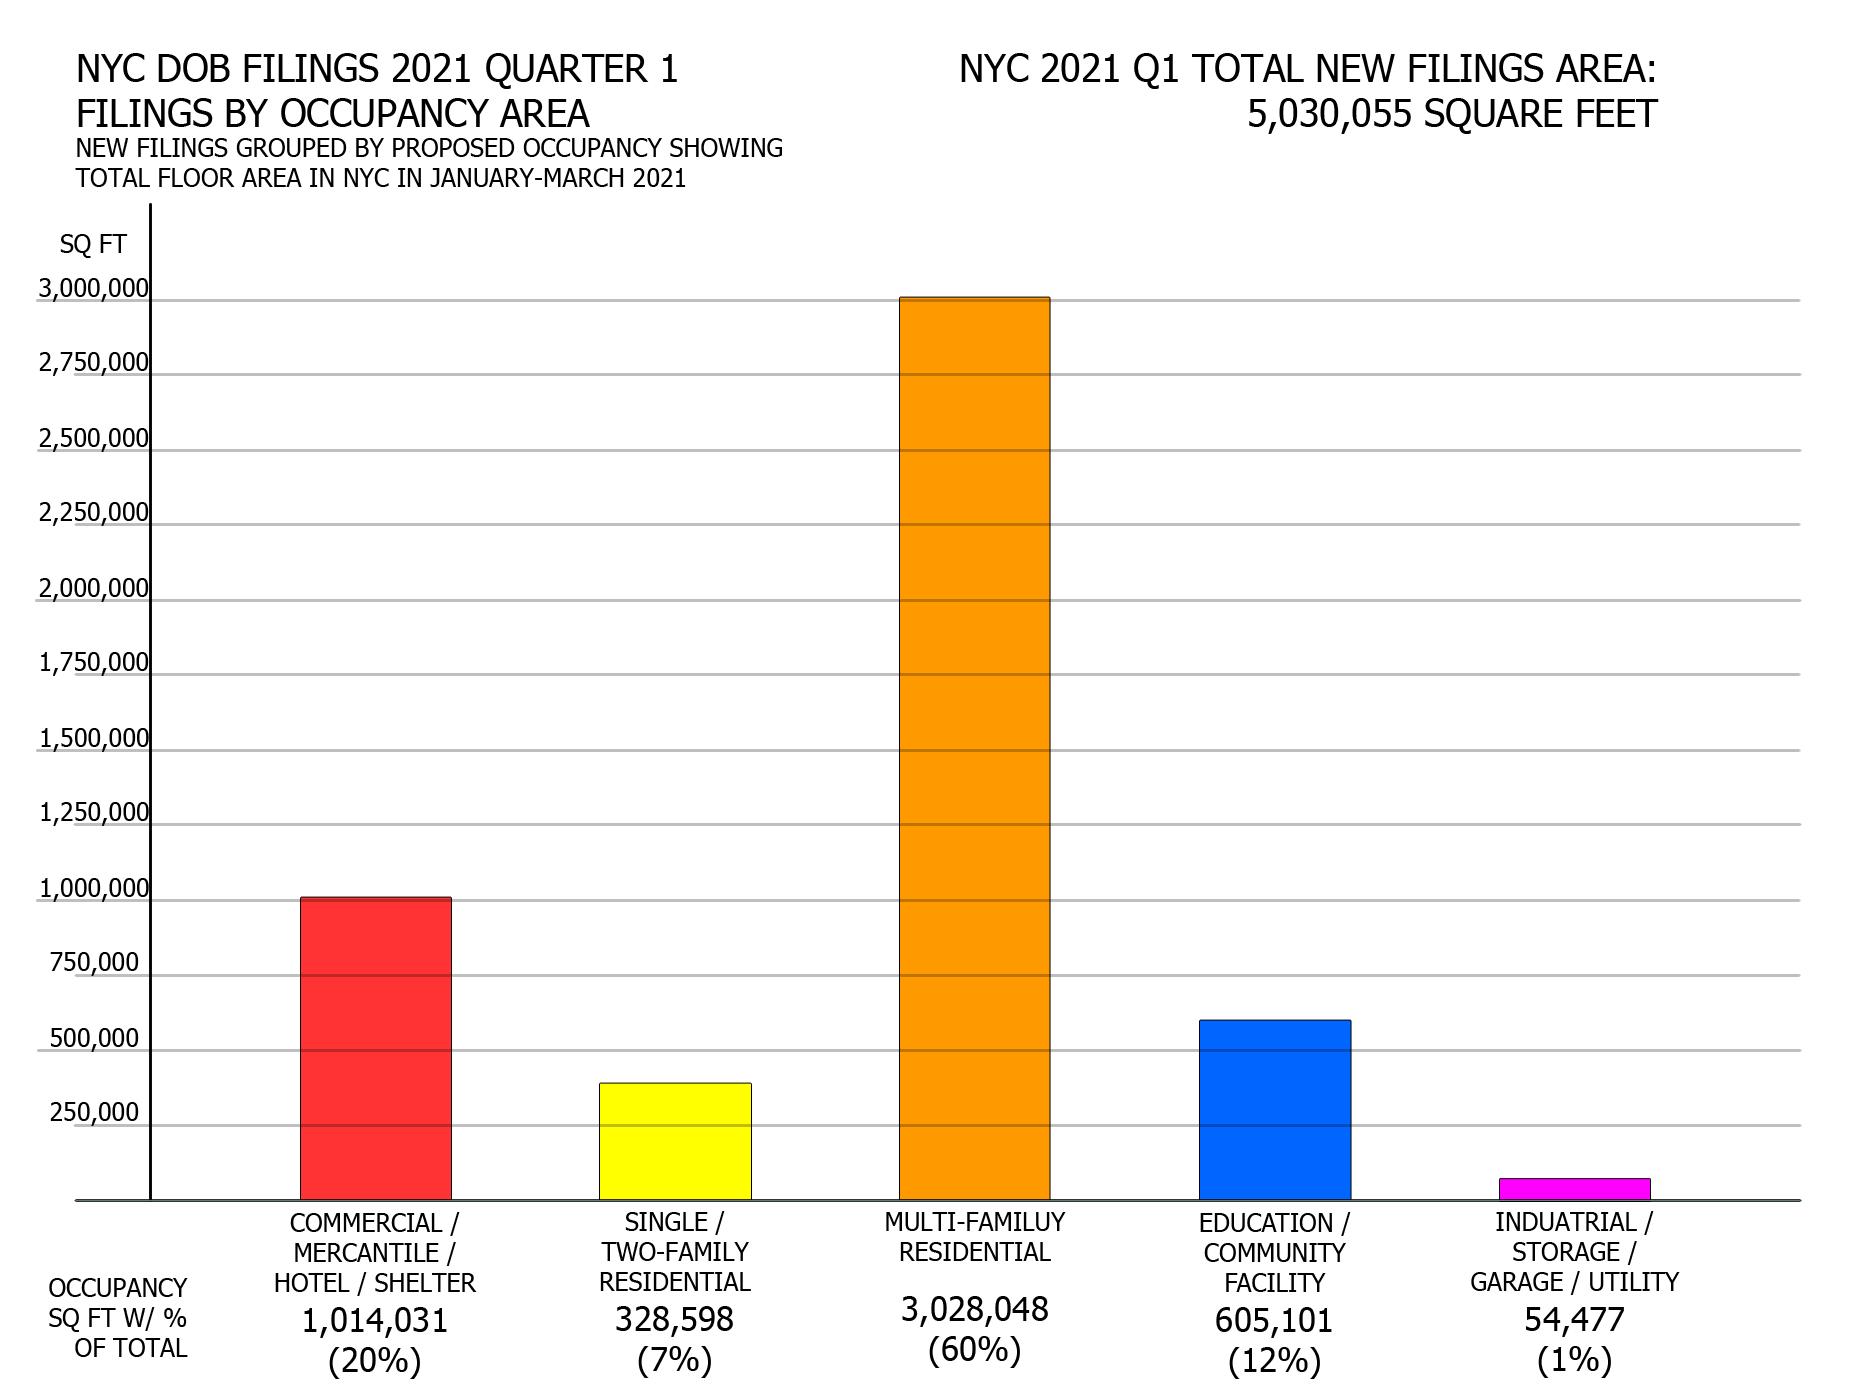 NYC DOB filings in first quarter of 2021 by proposed program square footage. Credit: Vitali Ogorodnikov